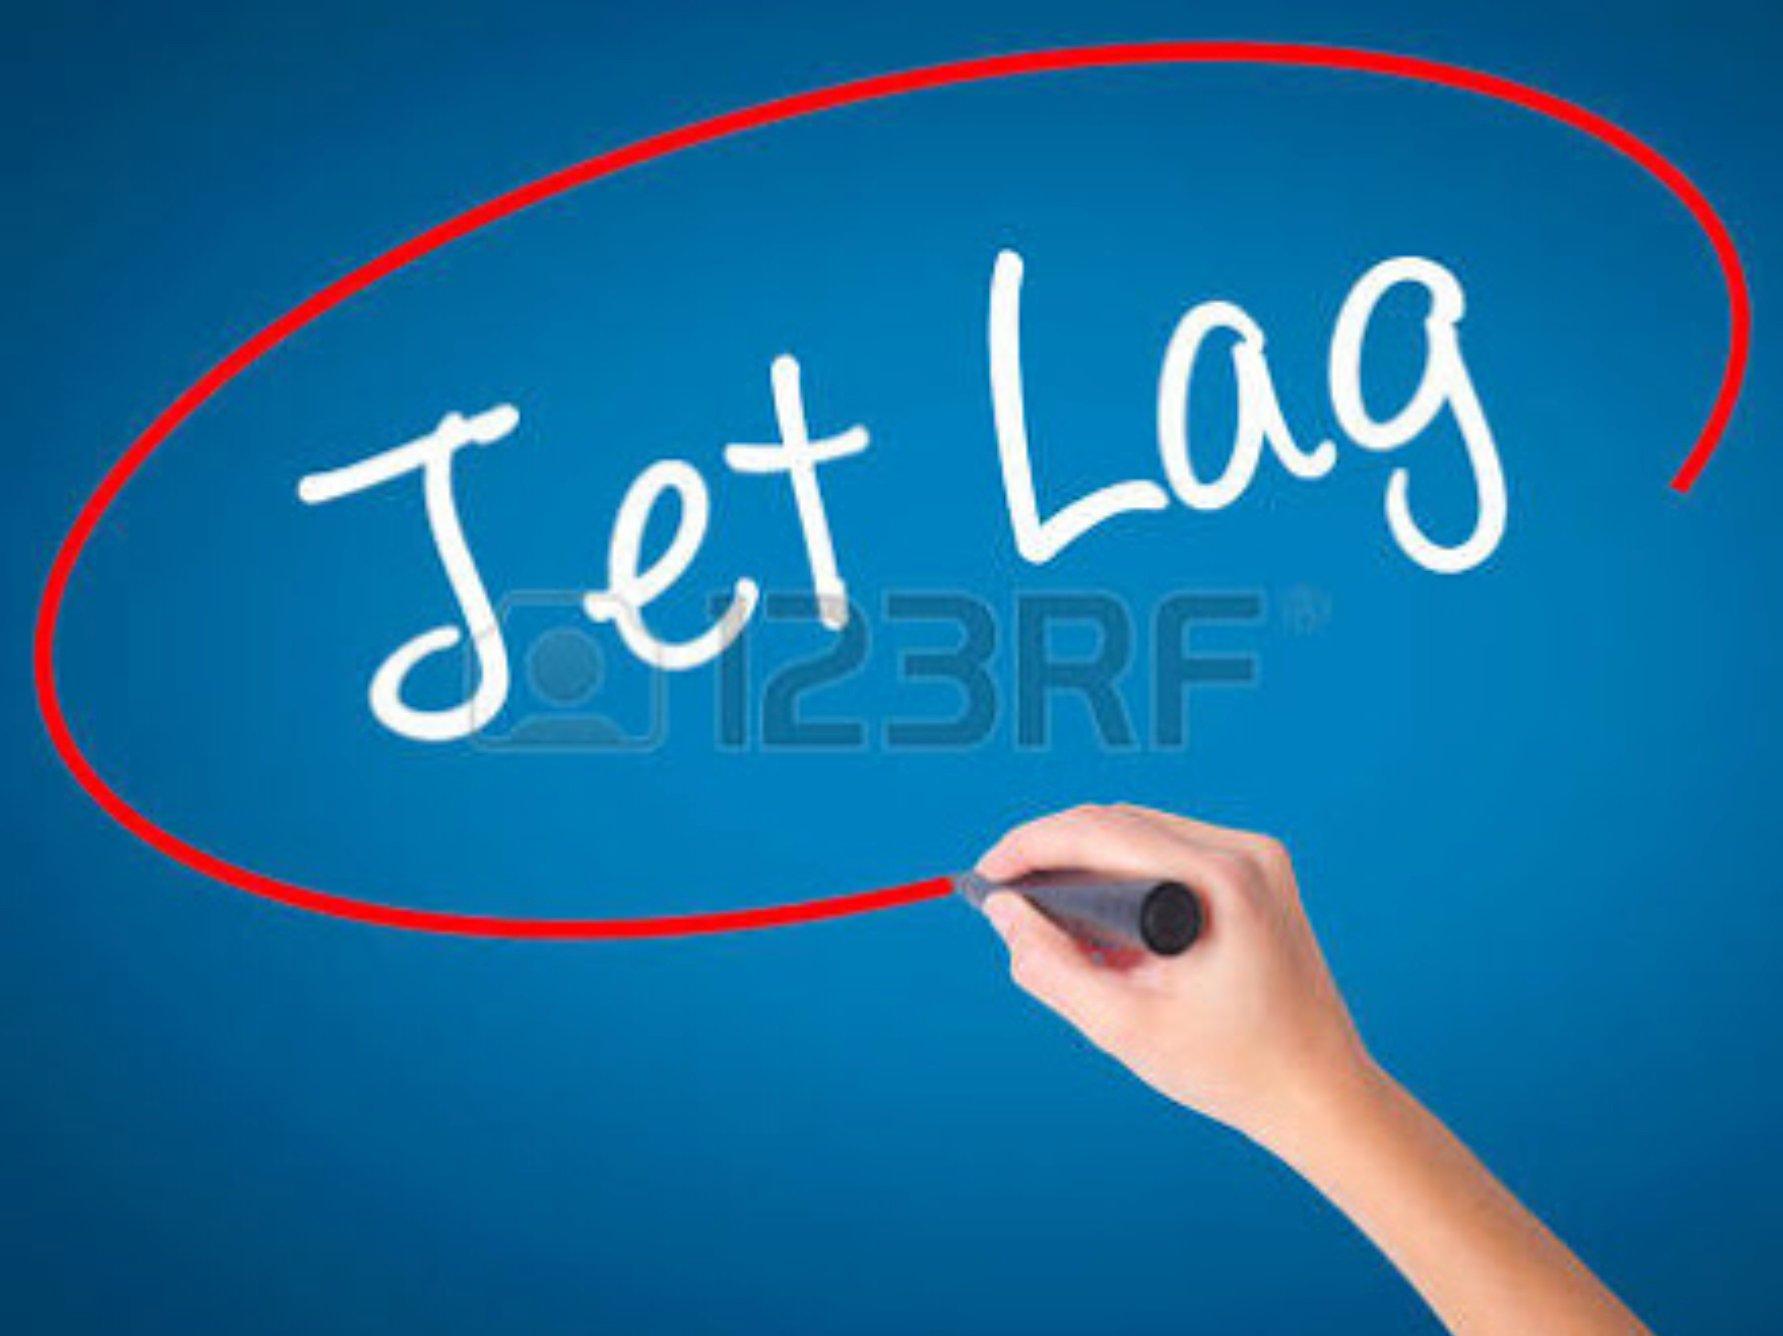 Does running help combat jet lag ?